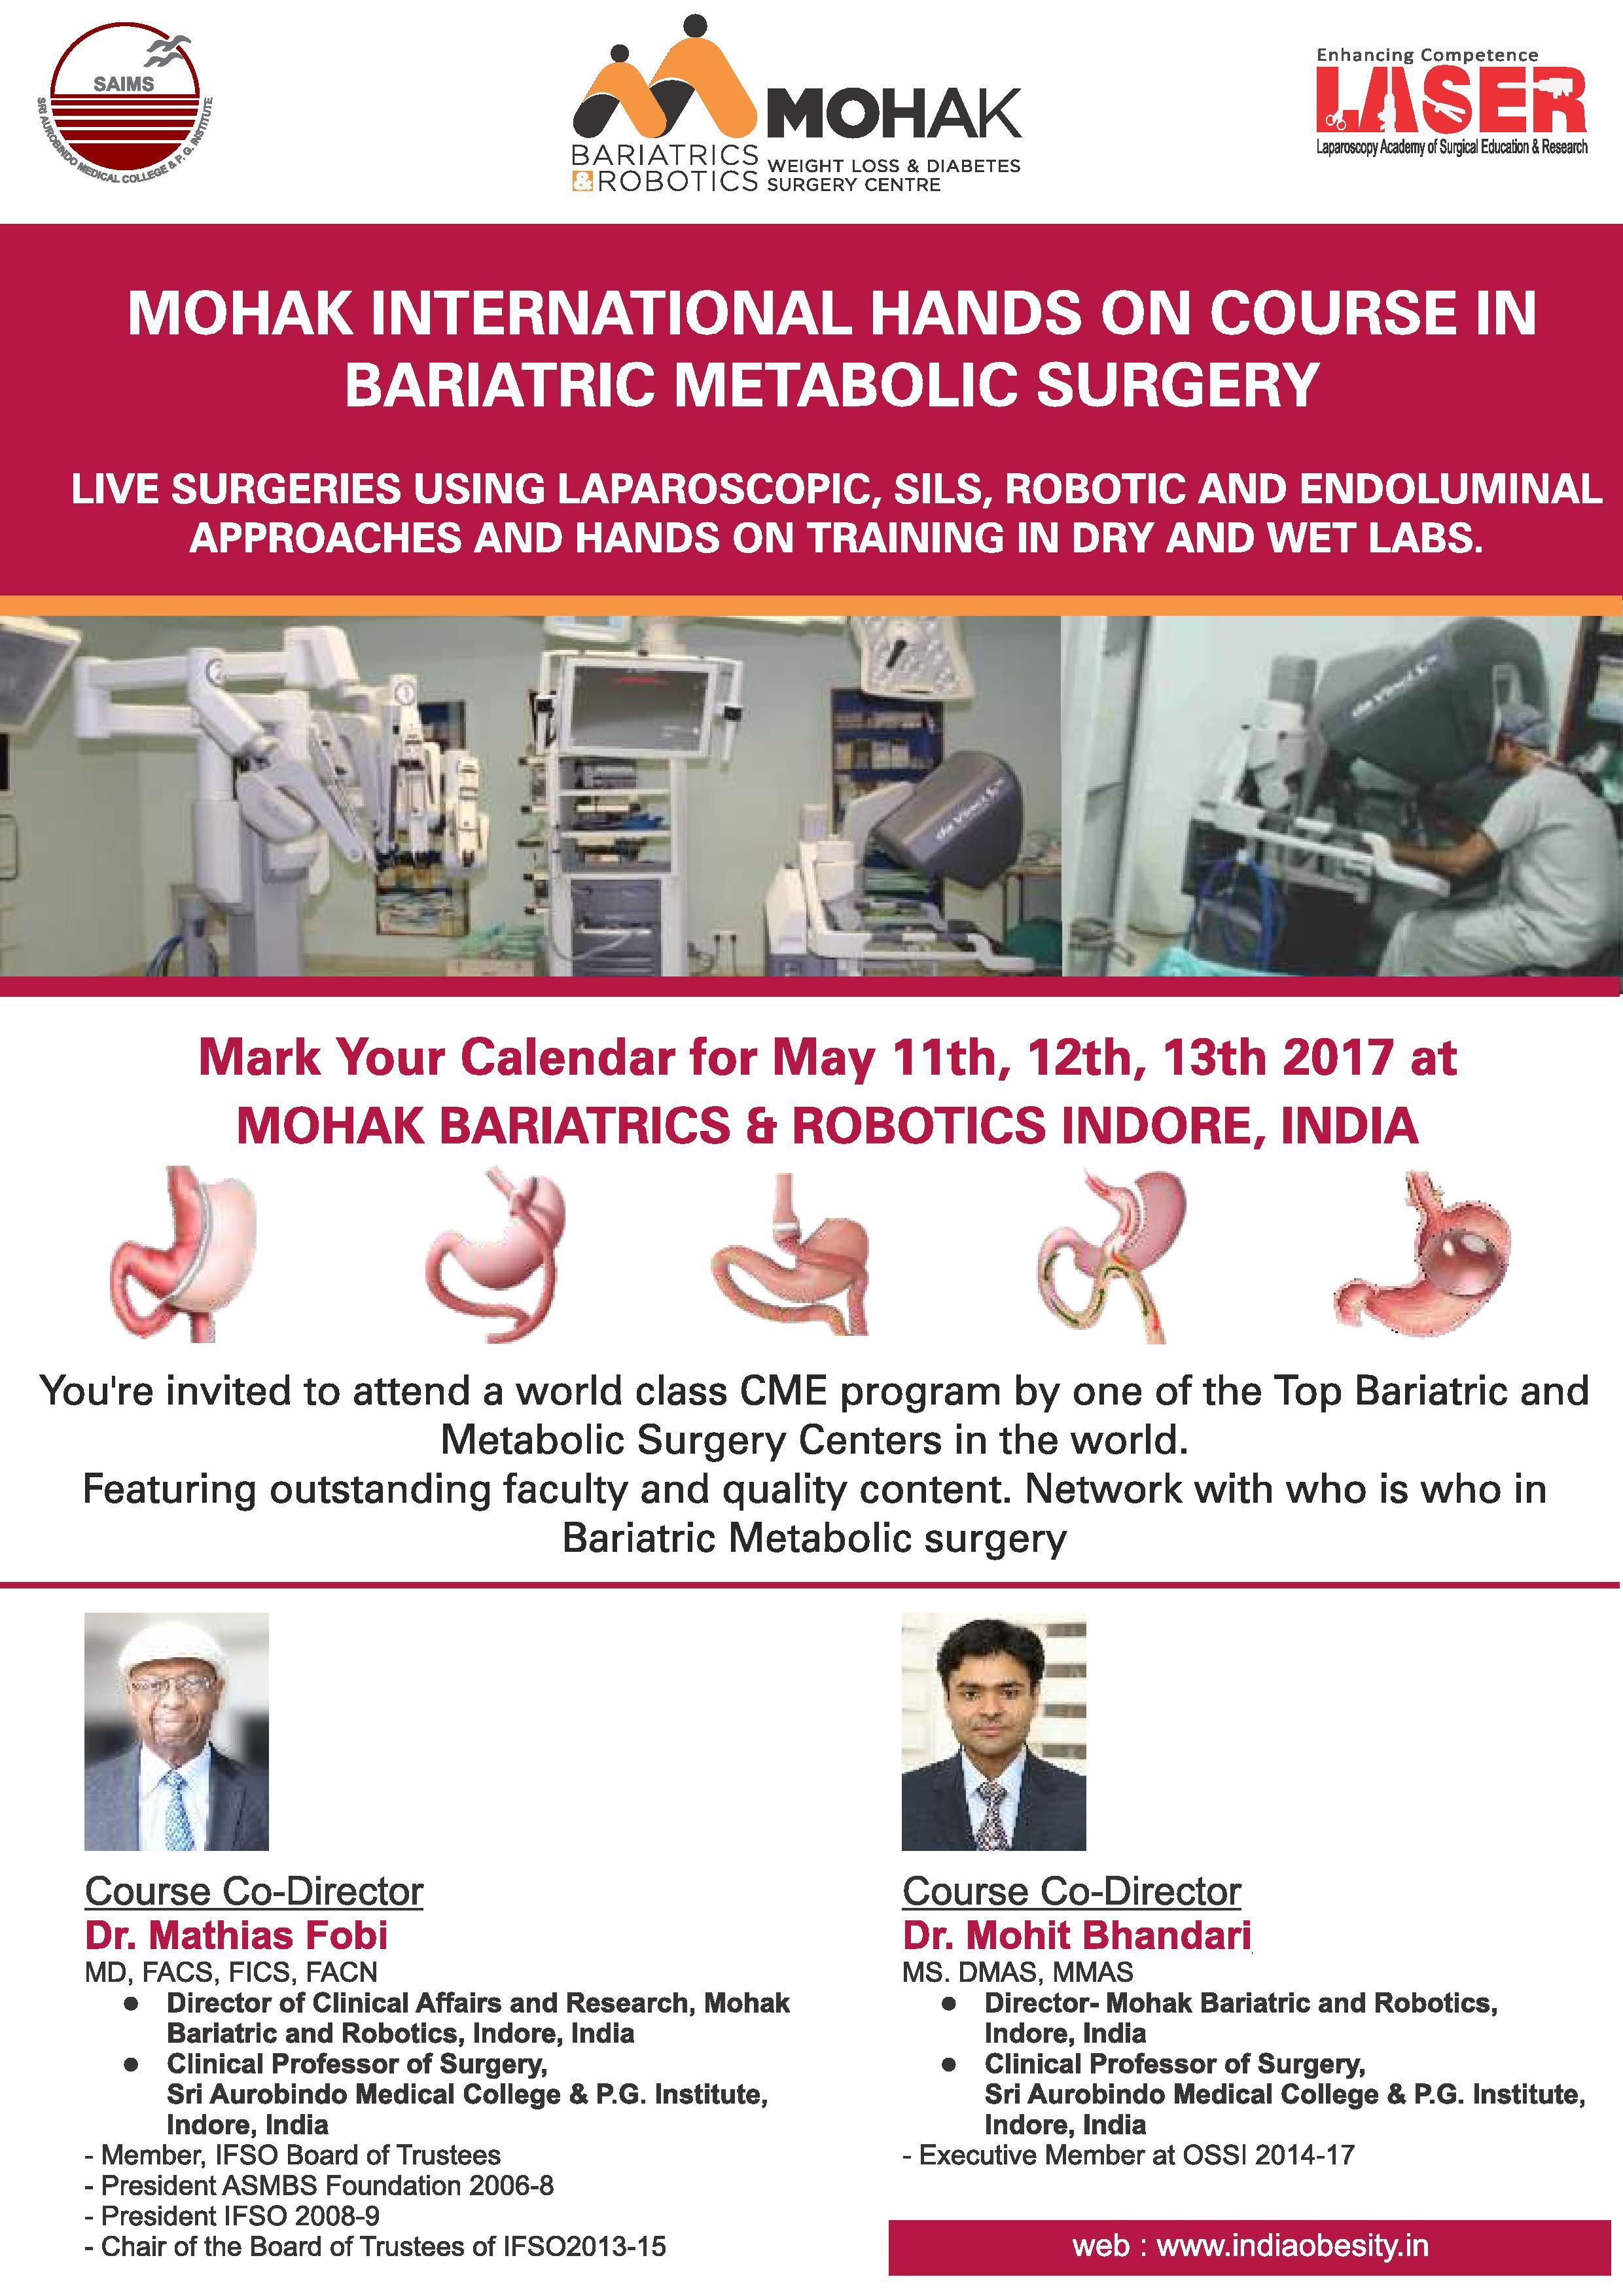 bariatric surgery workshop dr.fobi may 2017 (1)